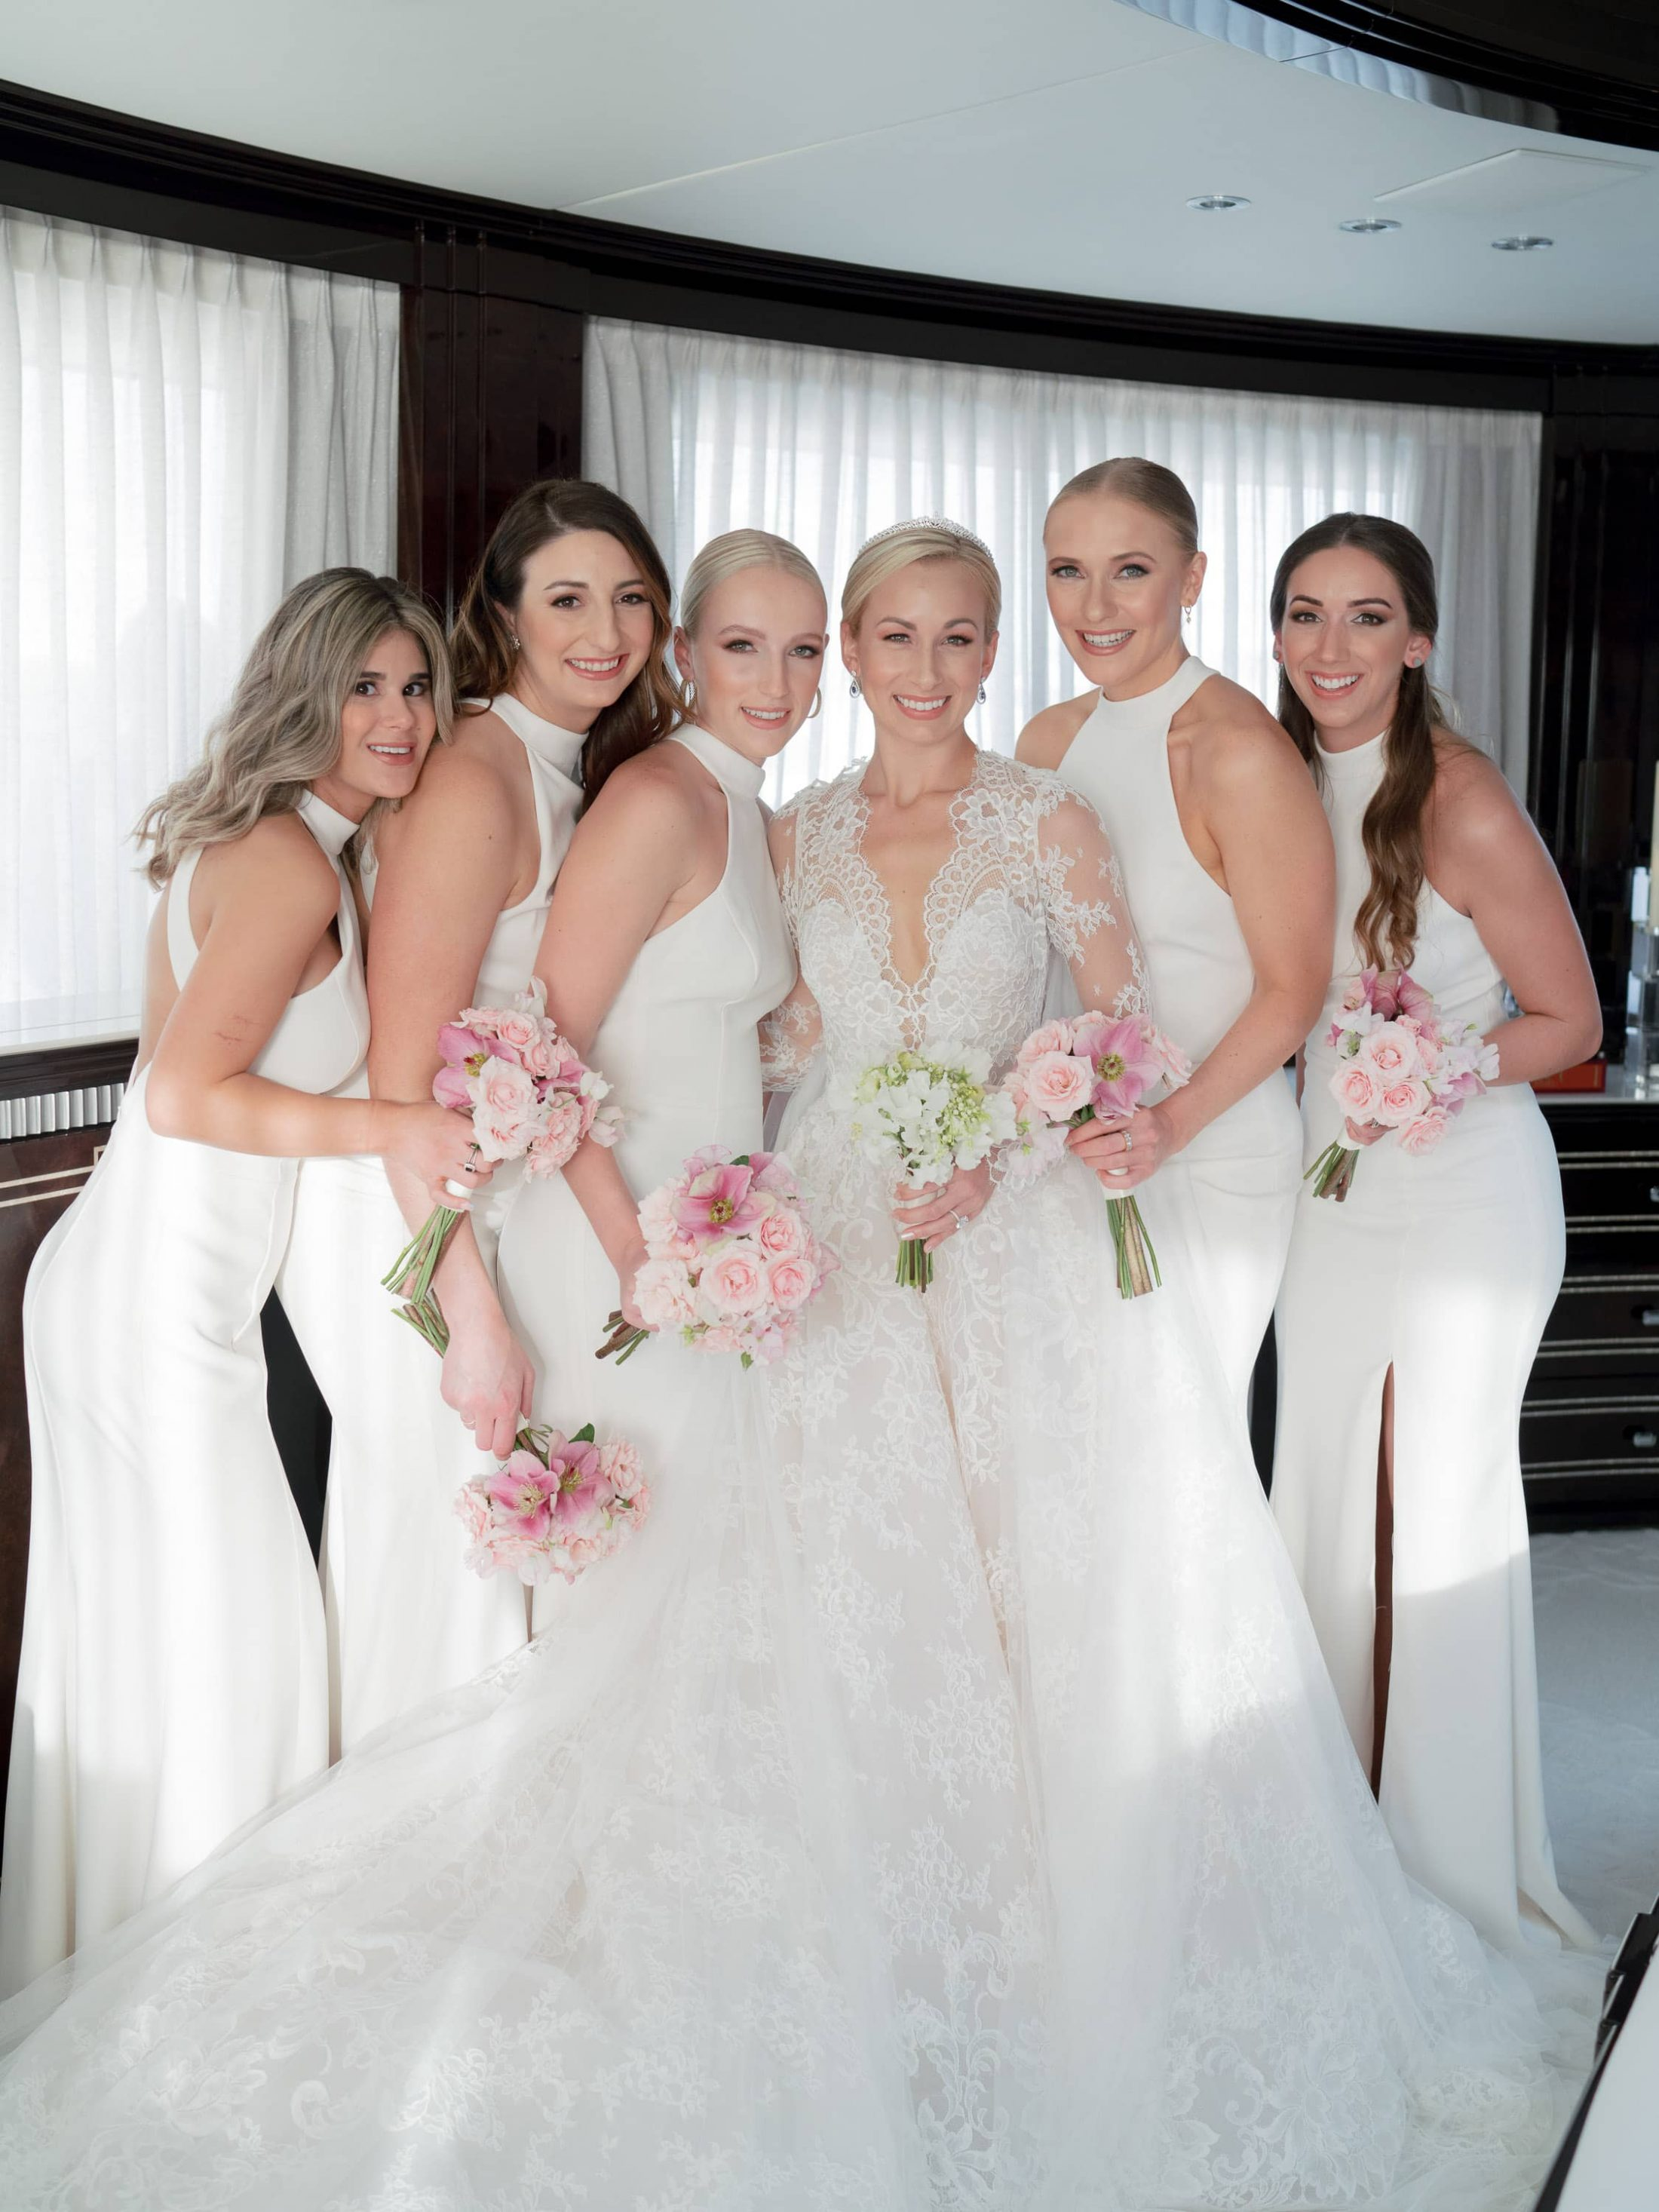 Bride with bridesmaids at this Miami yacht wedding | Photo by Corbin Gurkin